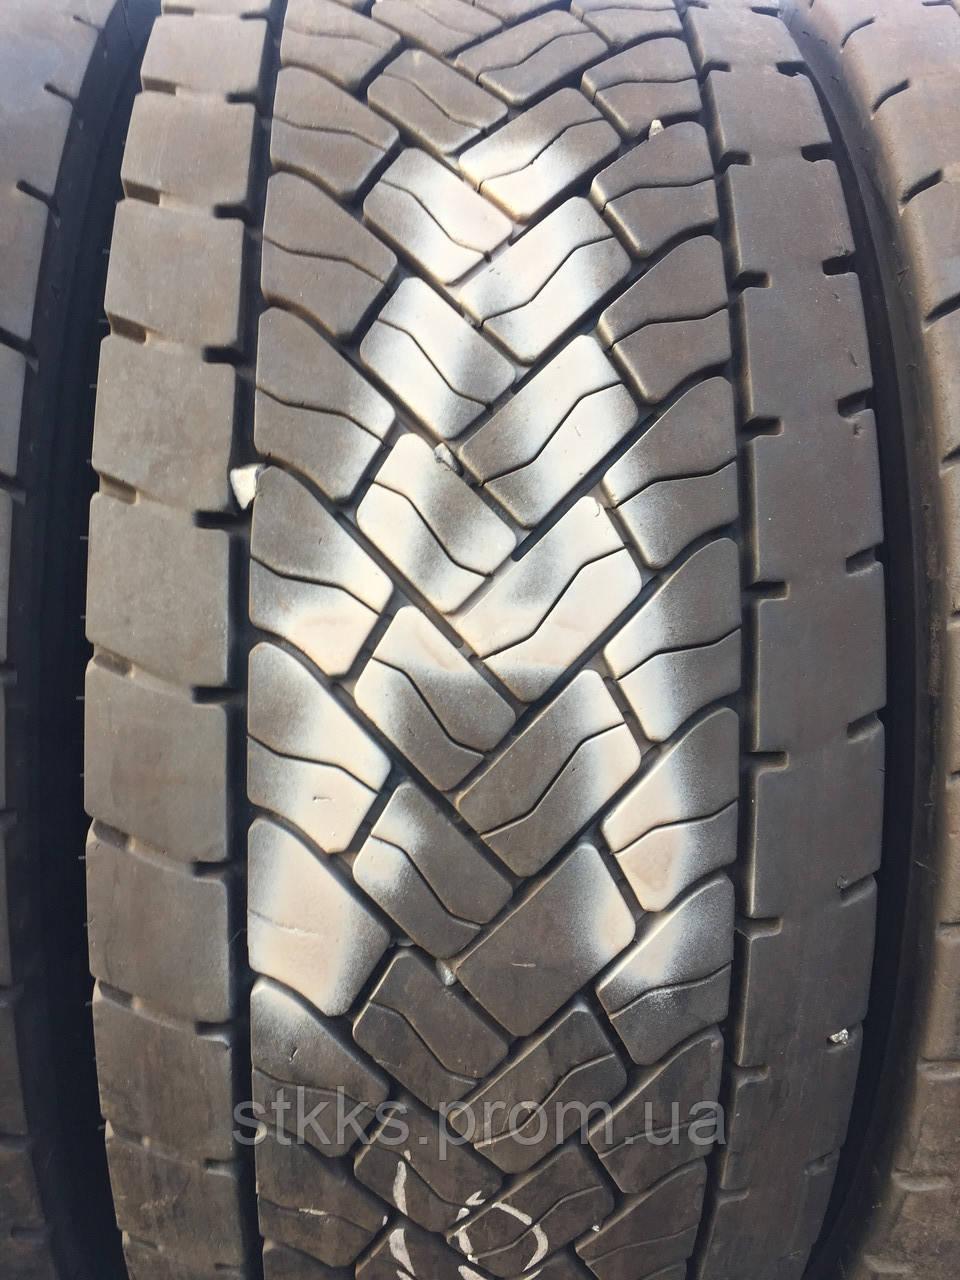 295/80R22,5 Dunlop SP446